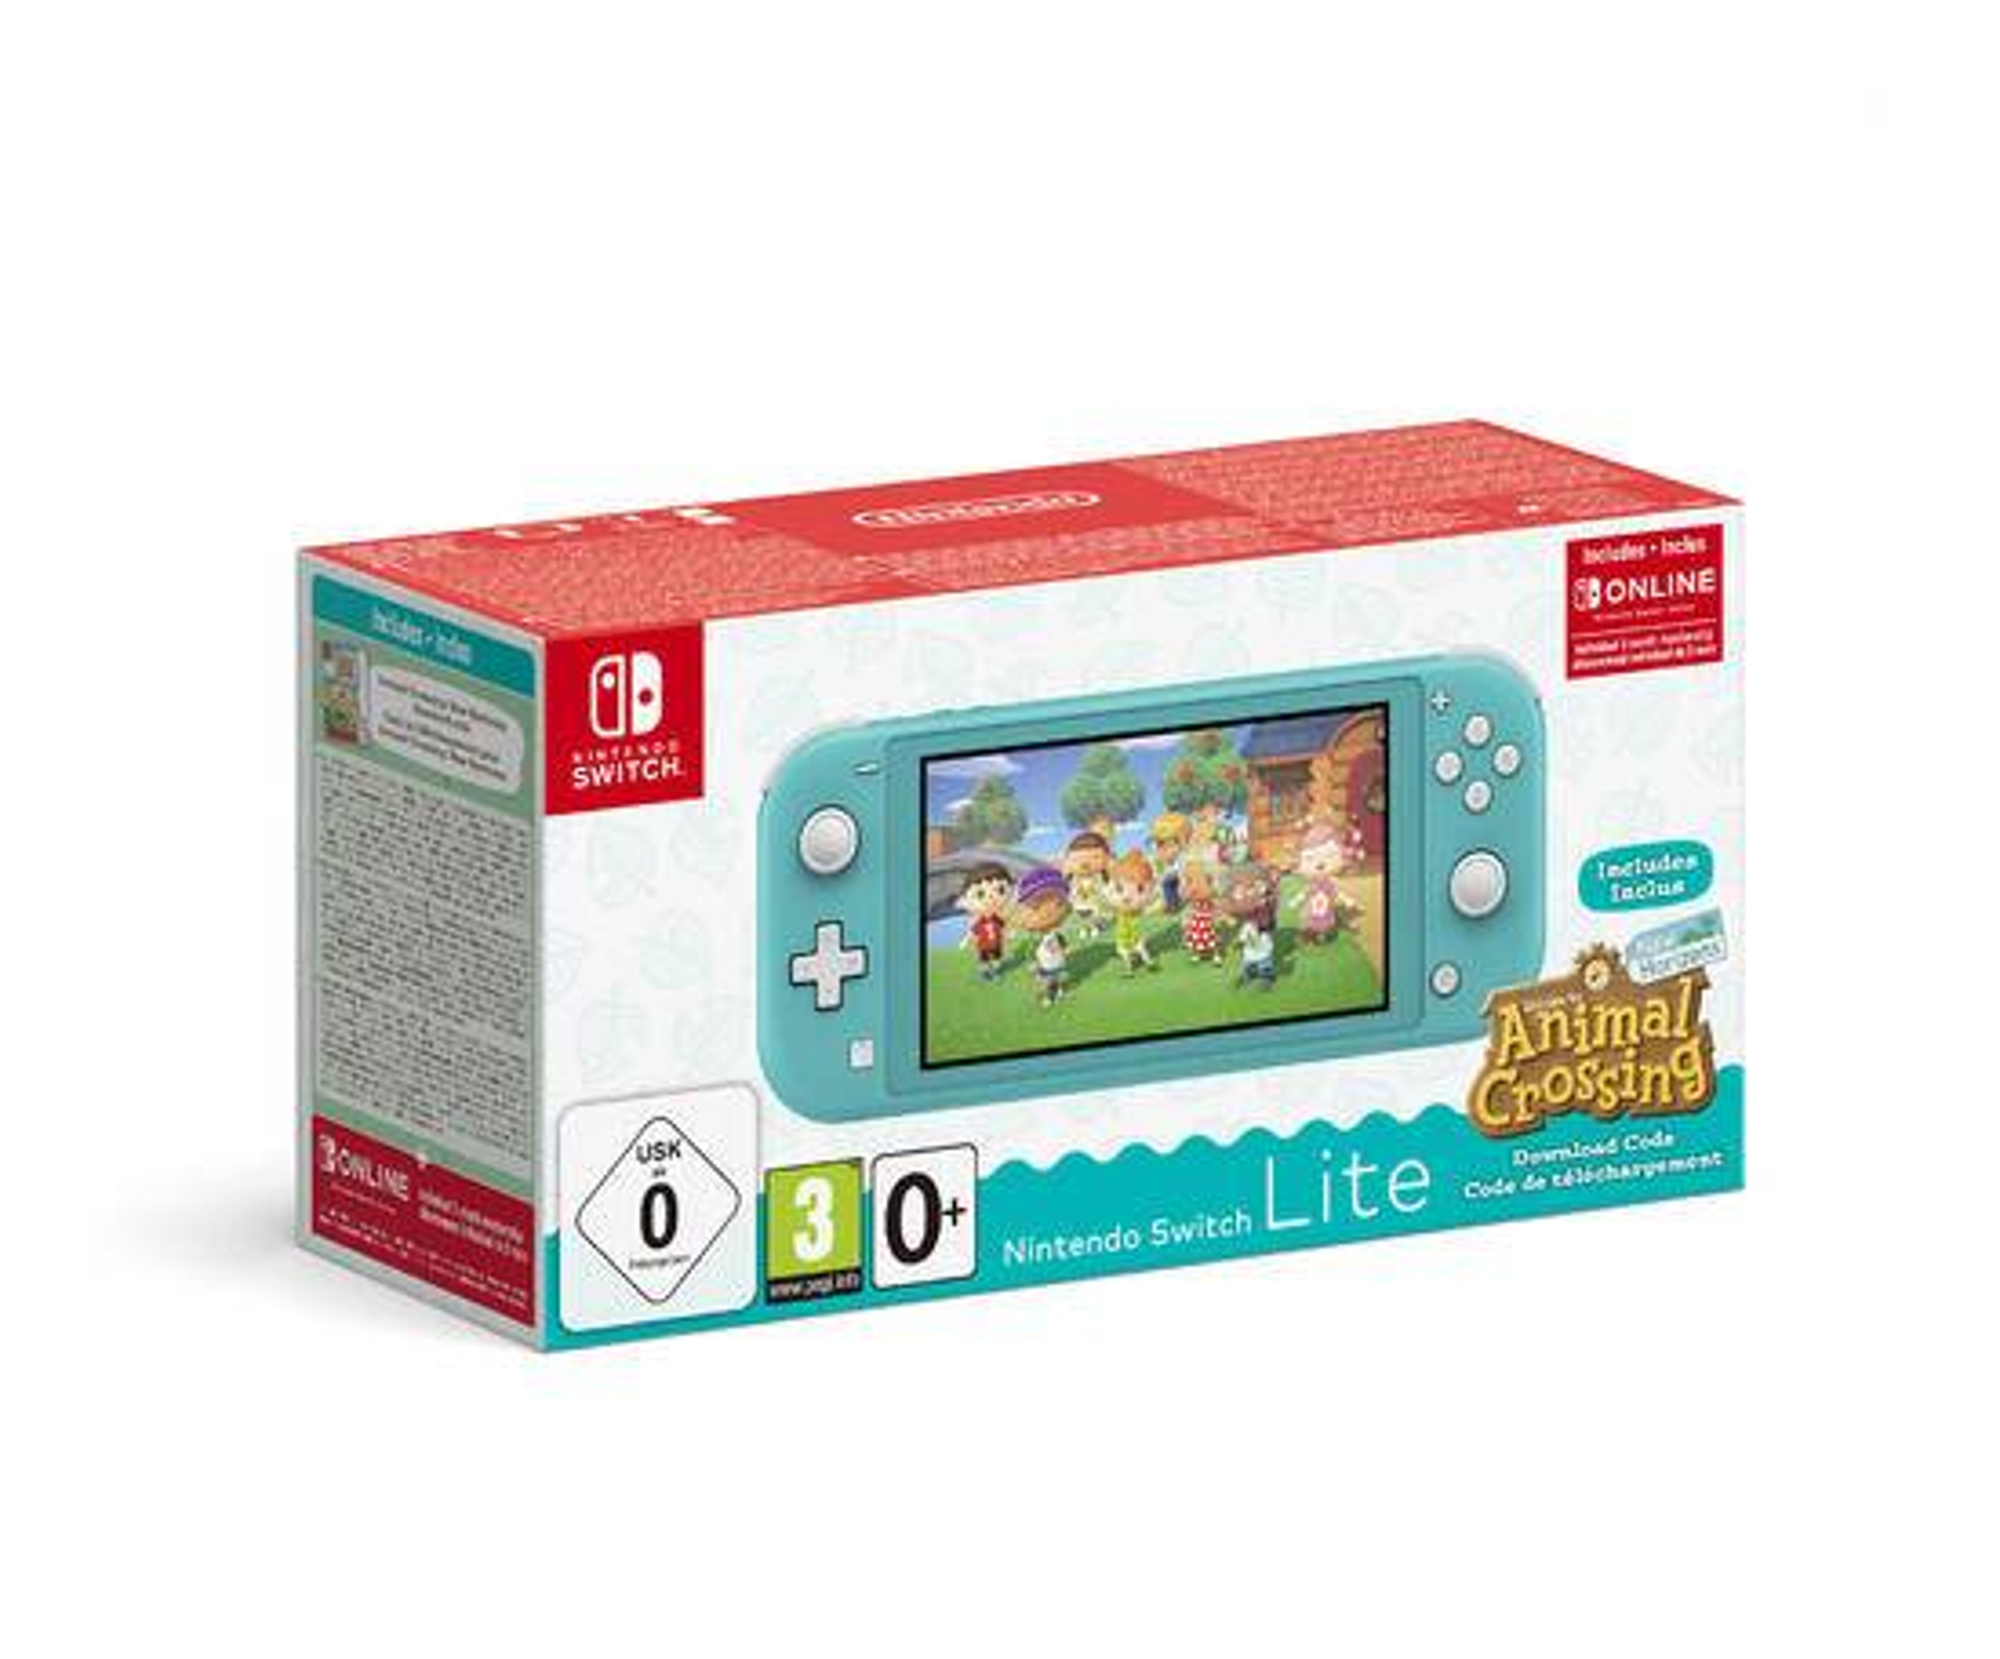 Nintendo Switch Lite Turchese + Animal Crossing New Horizons + Switch Online 3 Mesi